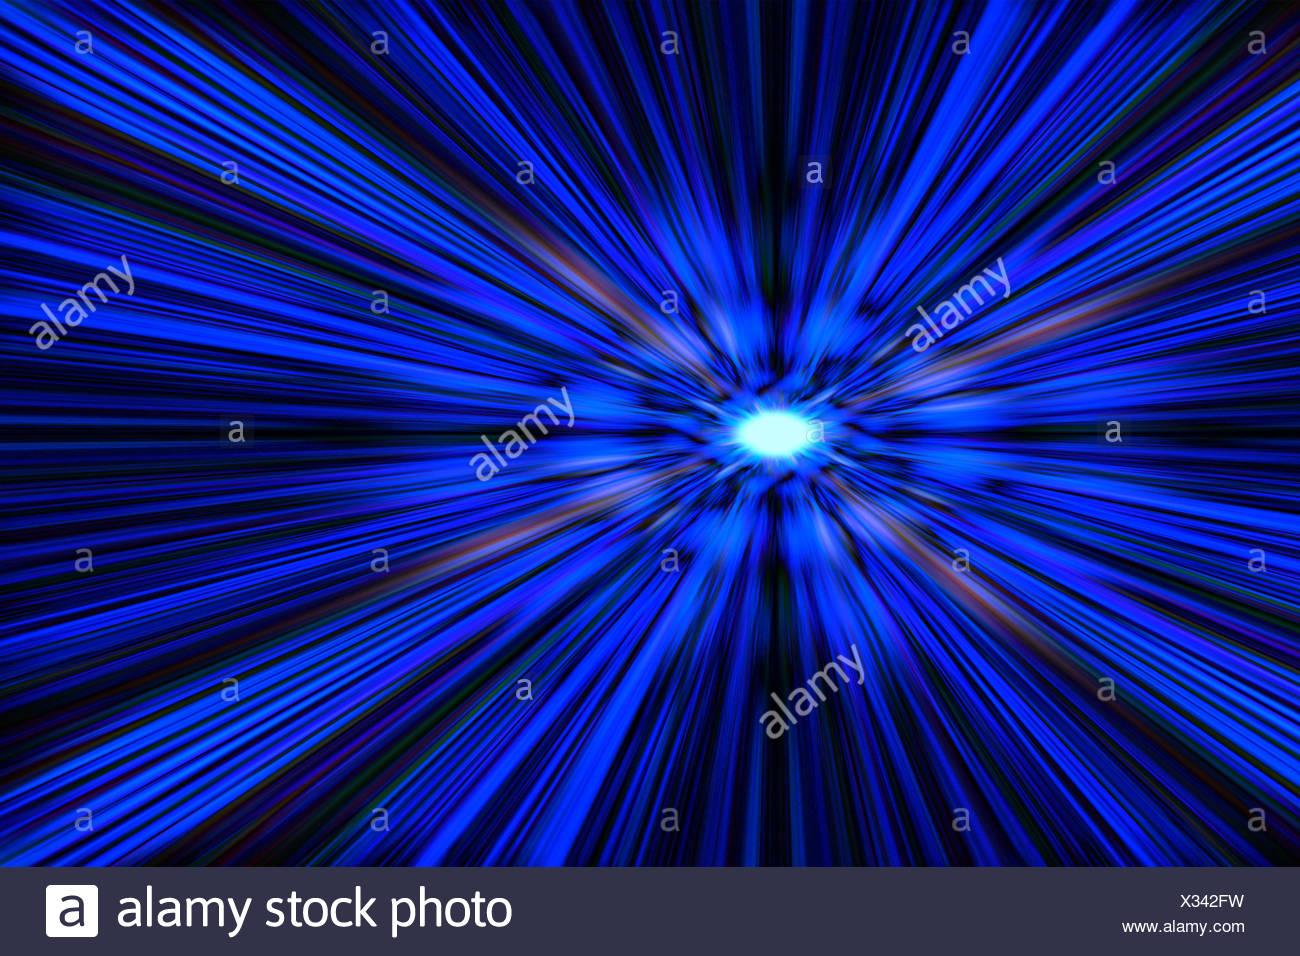 Blue Flash Explosion On A Black Background Stock Photo Alamy